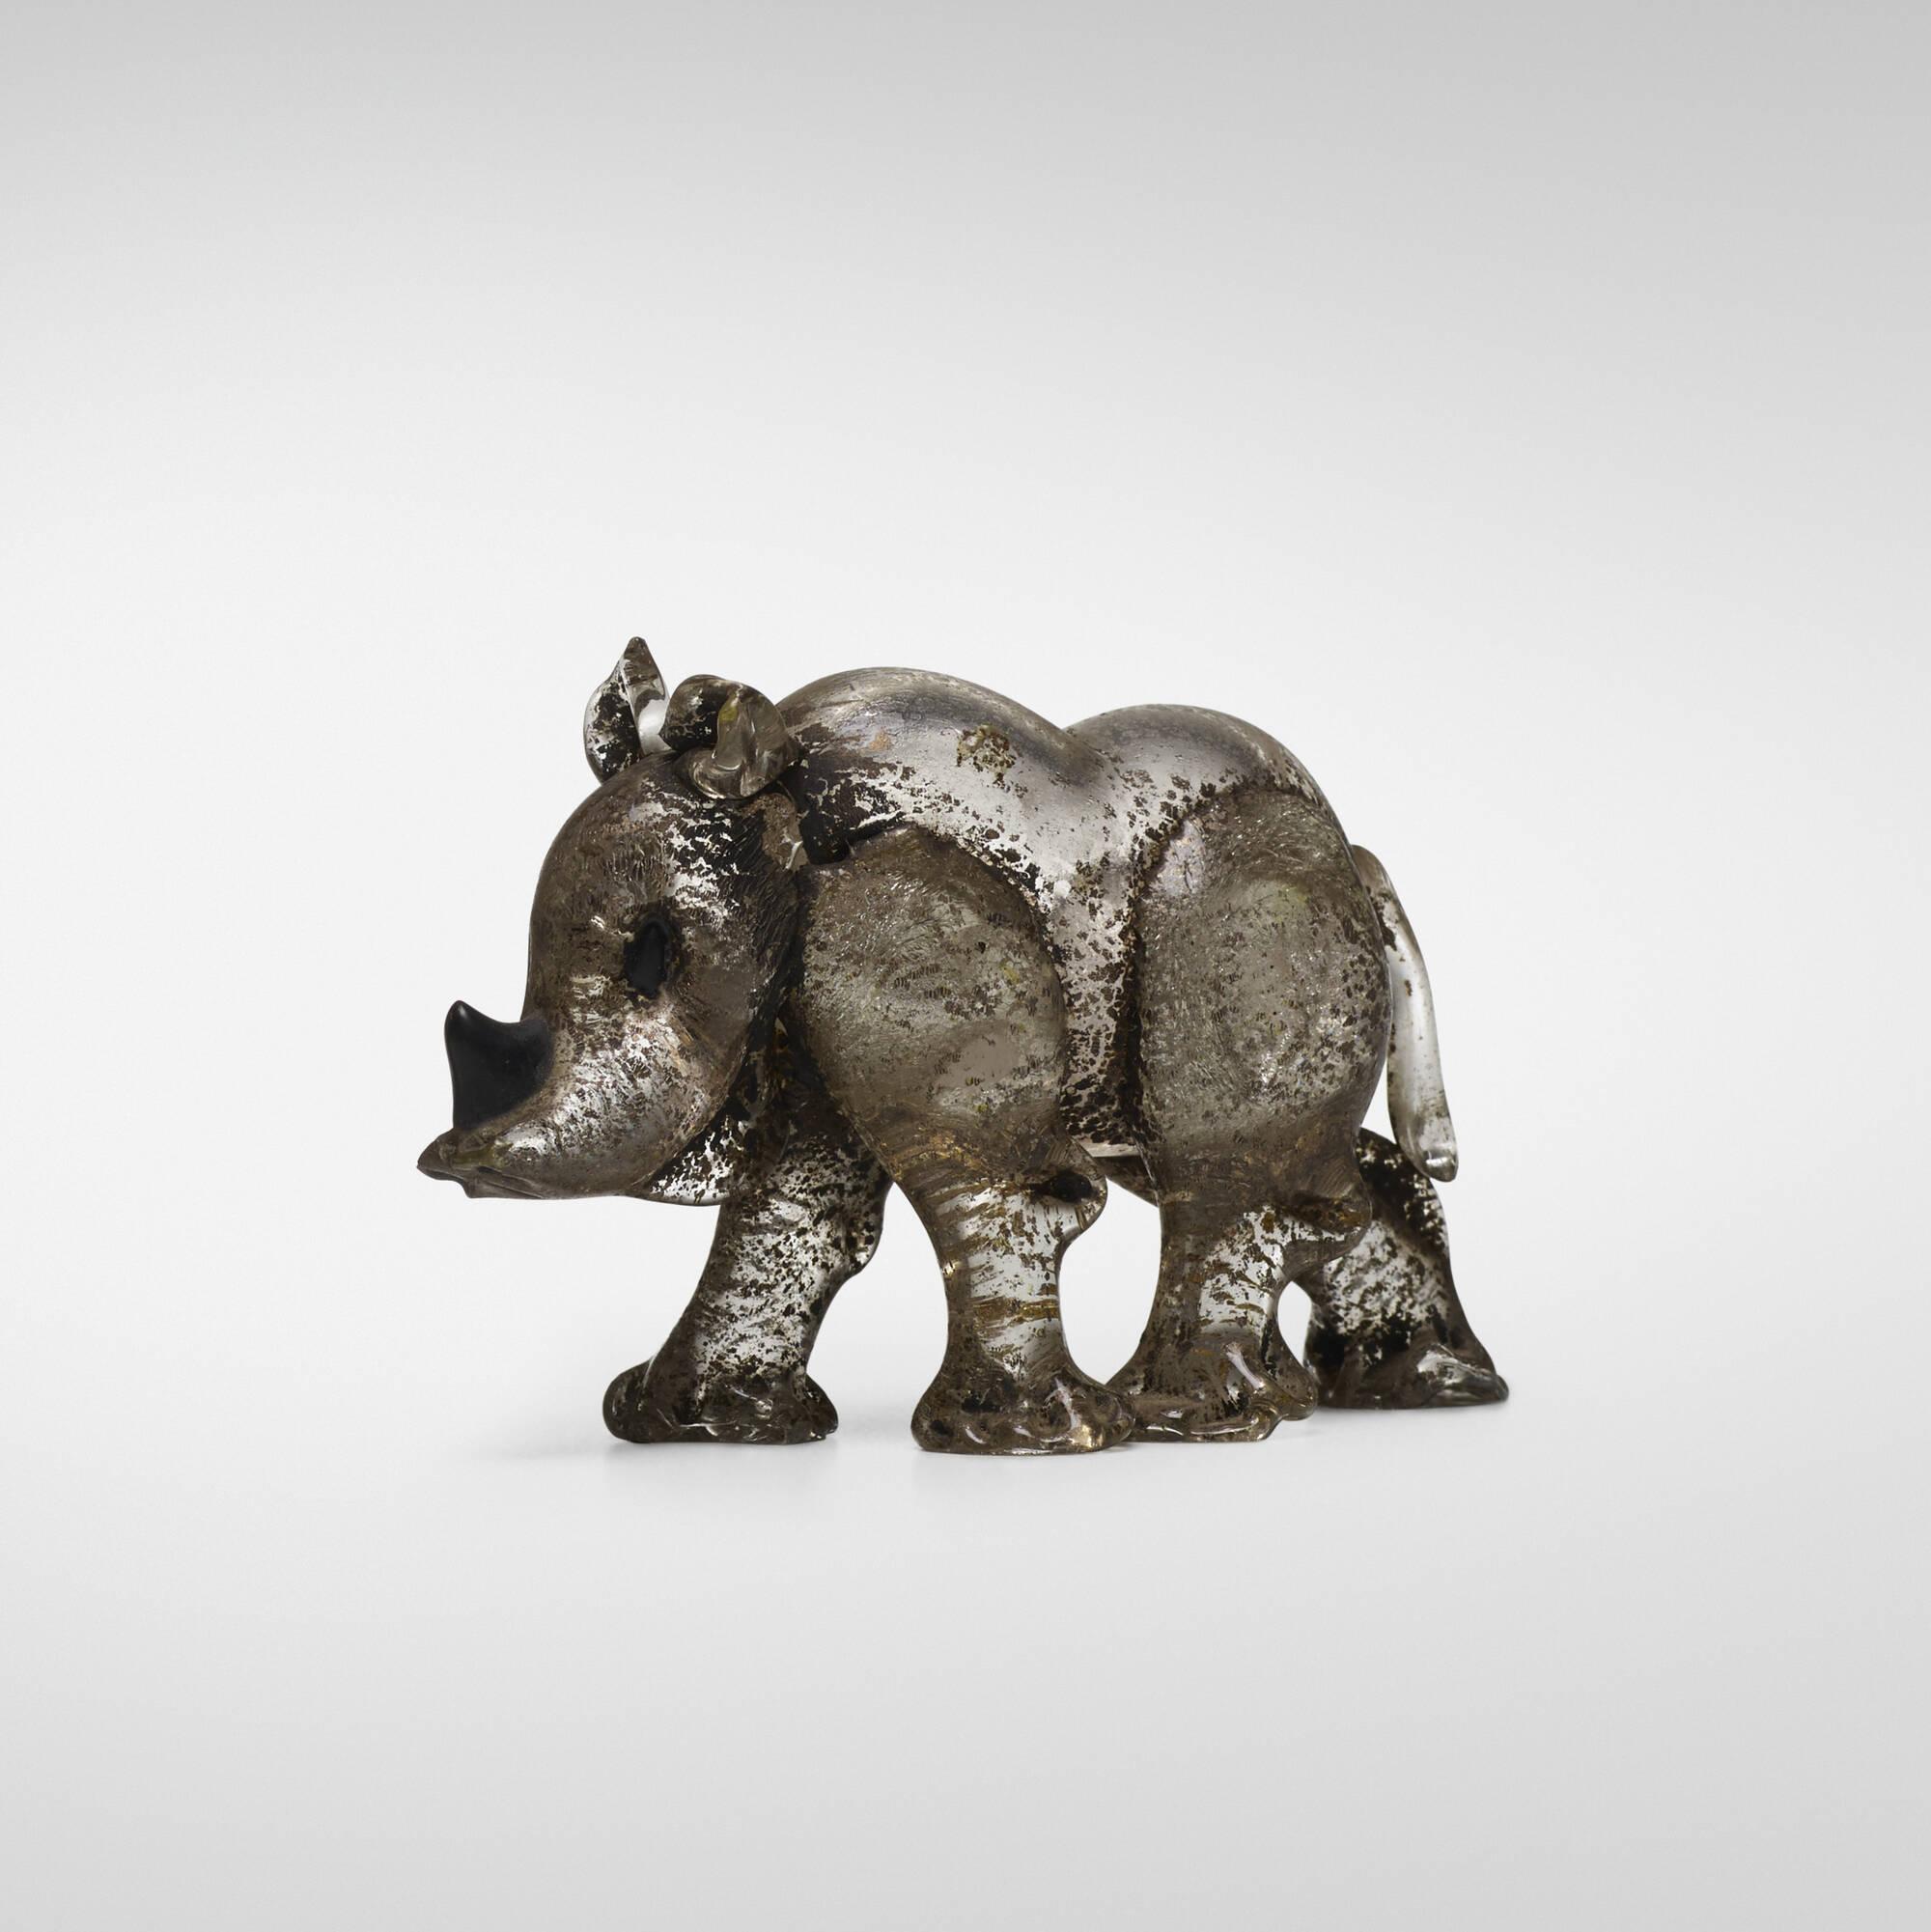 120: Ercole Barovier / Rinoceronte (1 of 1)